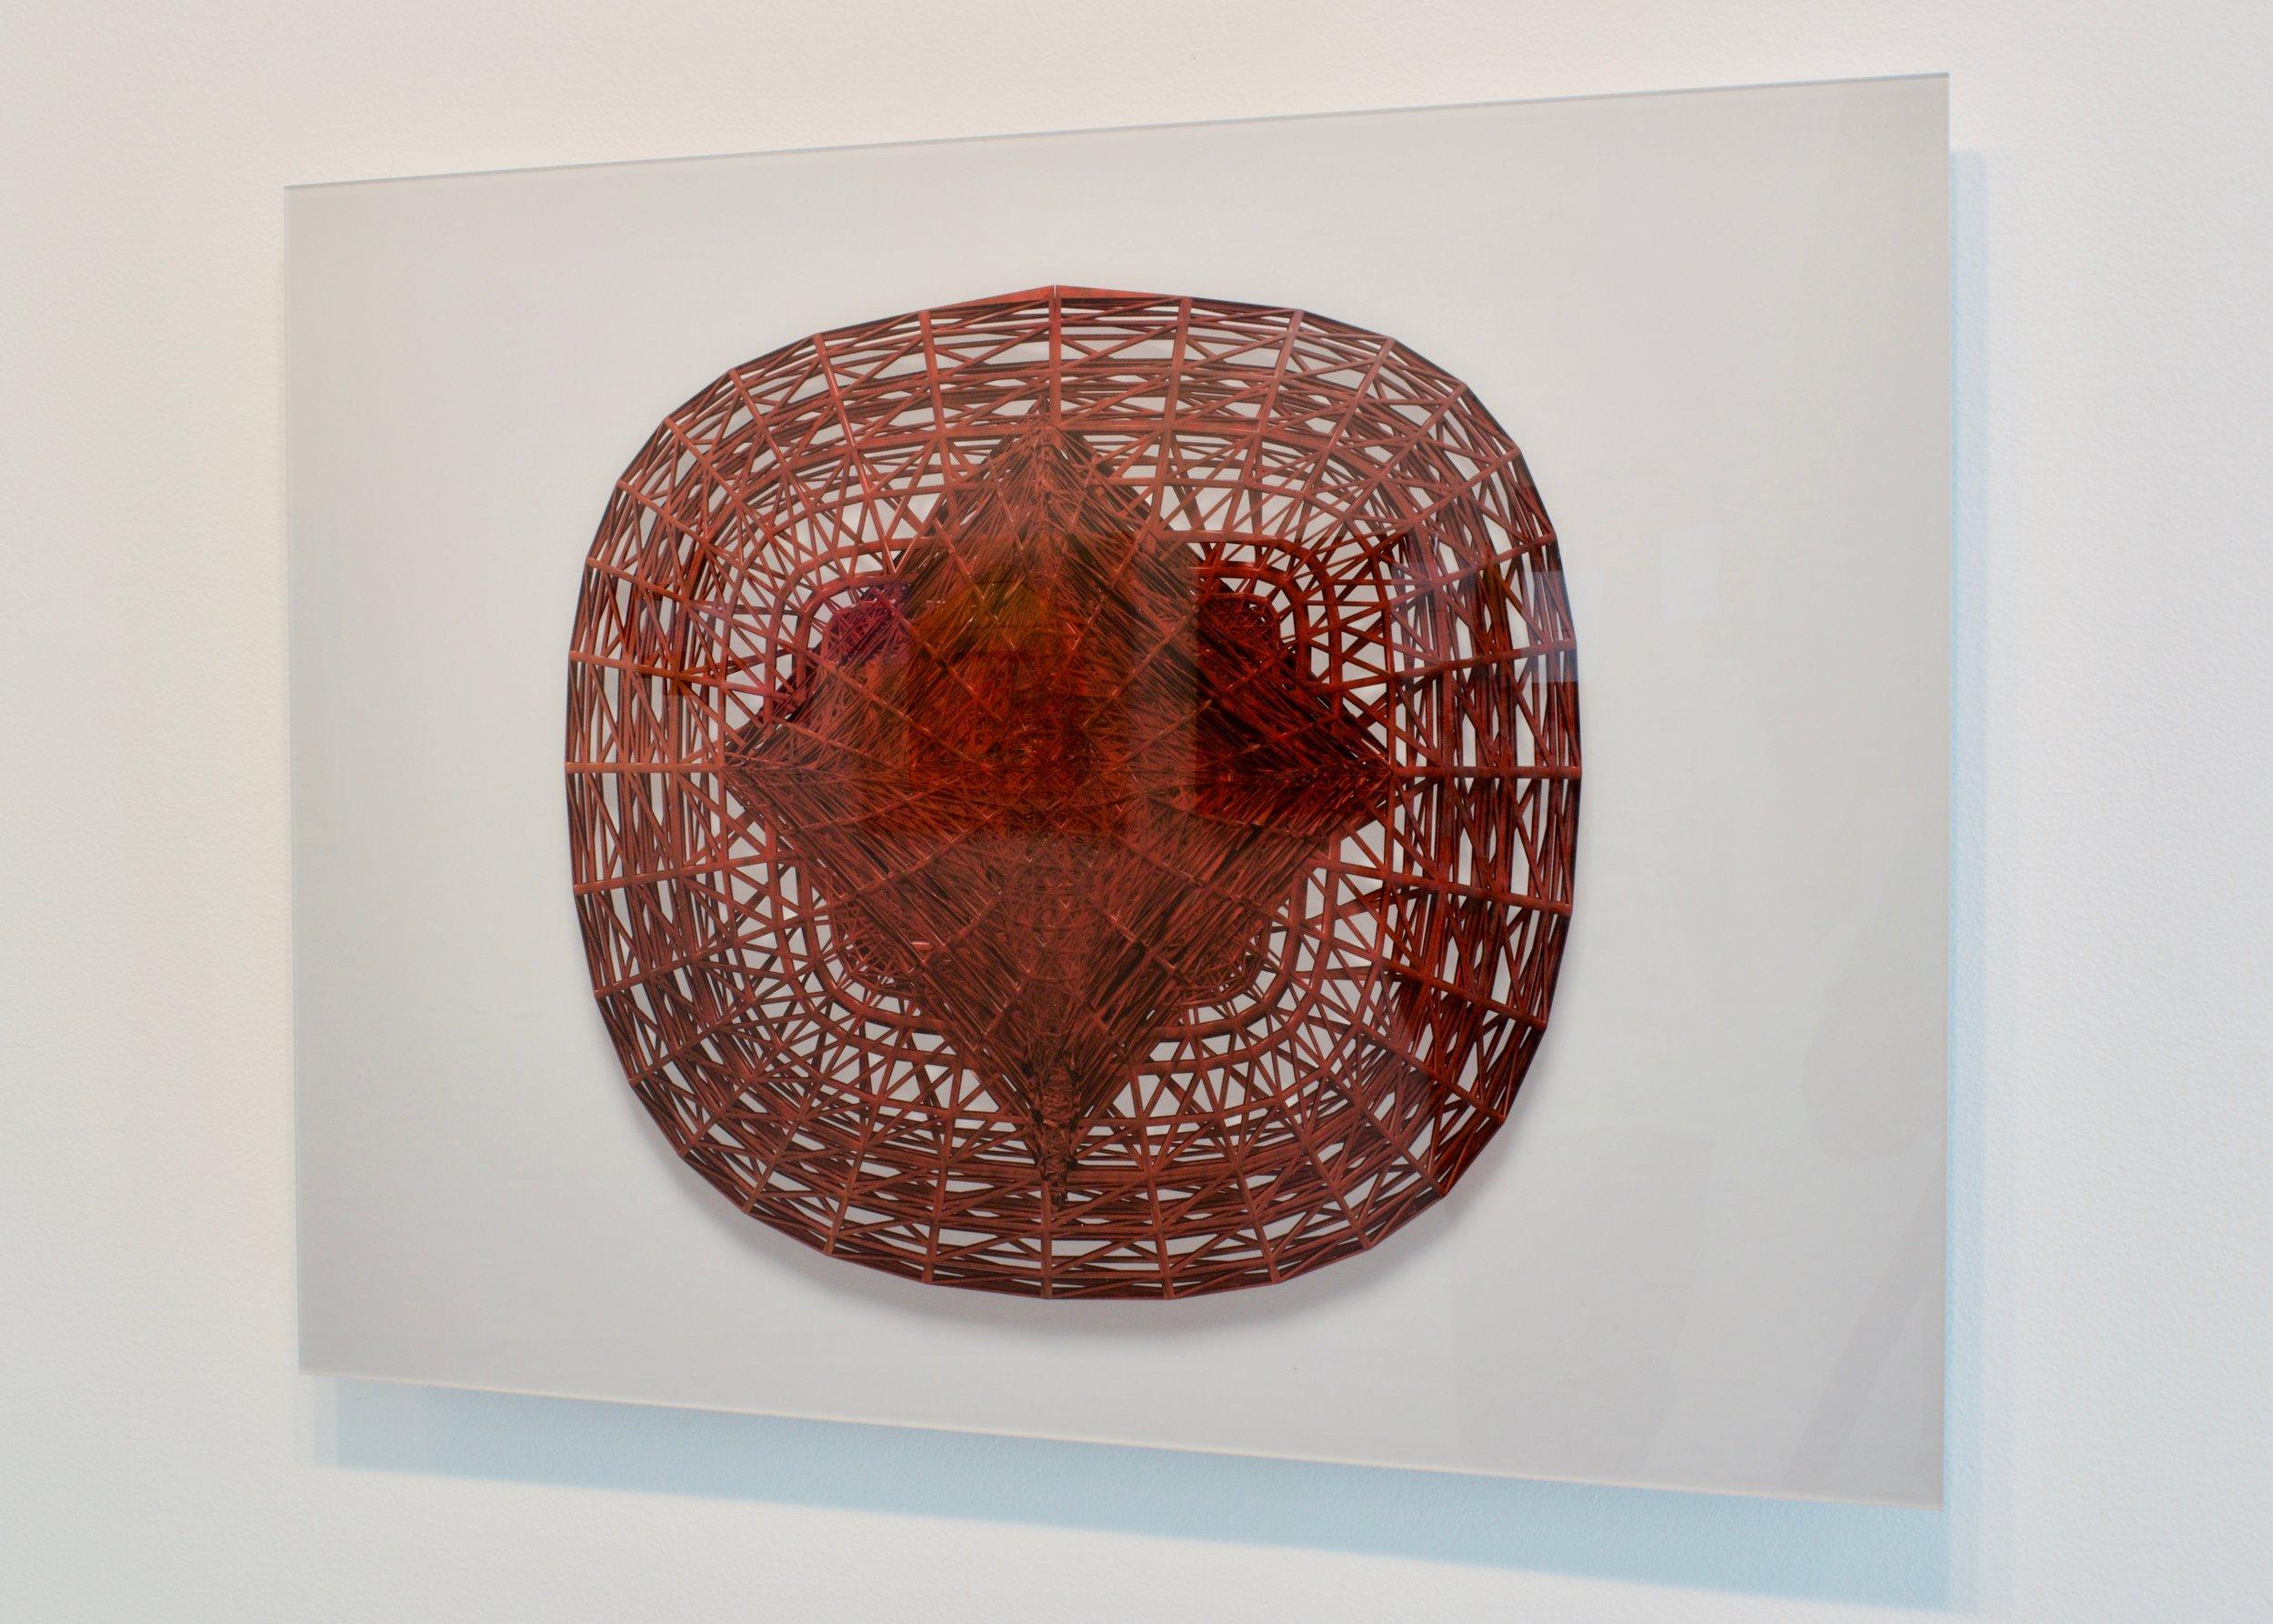 Leonardo's Signature Basket, 2019.  Inkjet print mounted on dibond, 19.5 x 26 inches